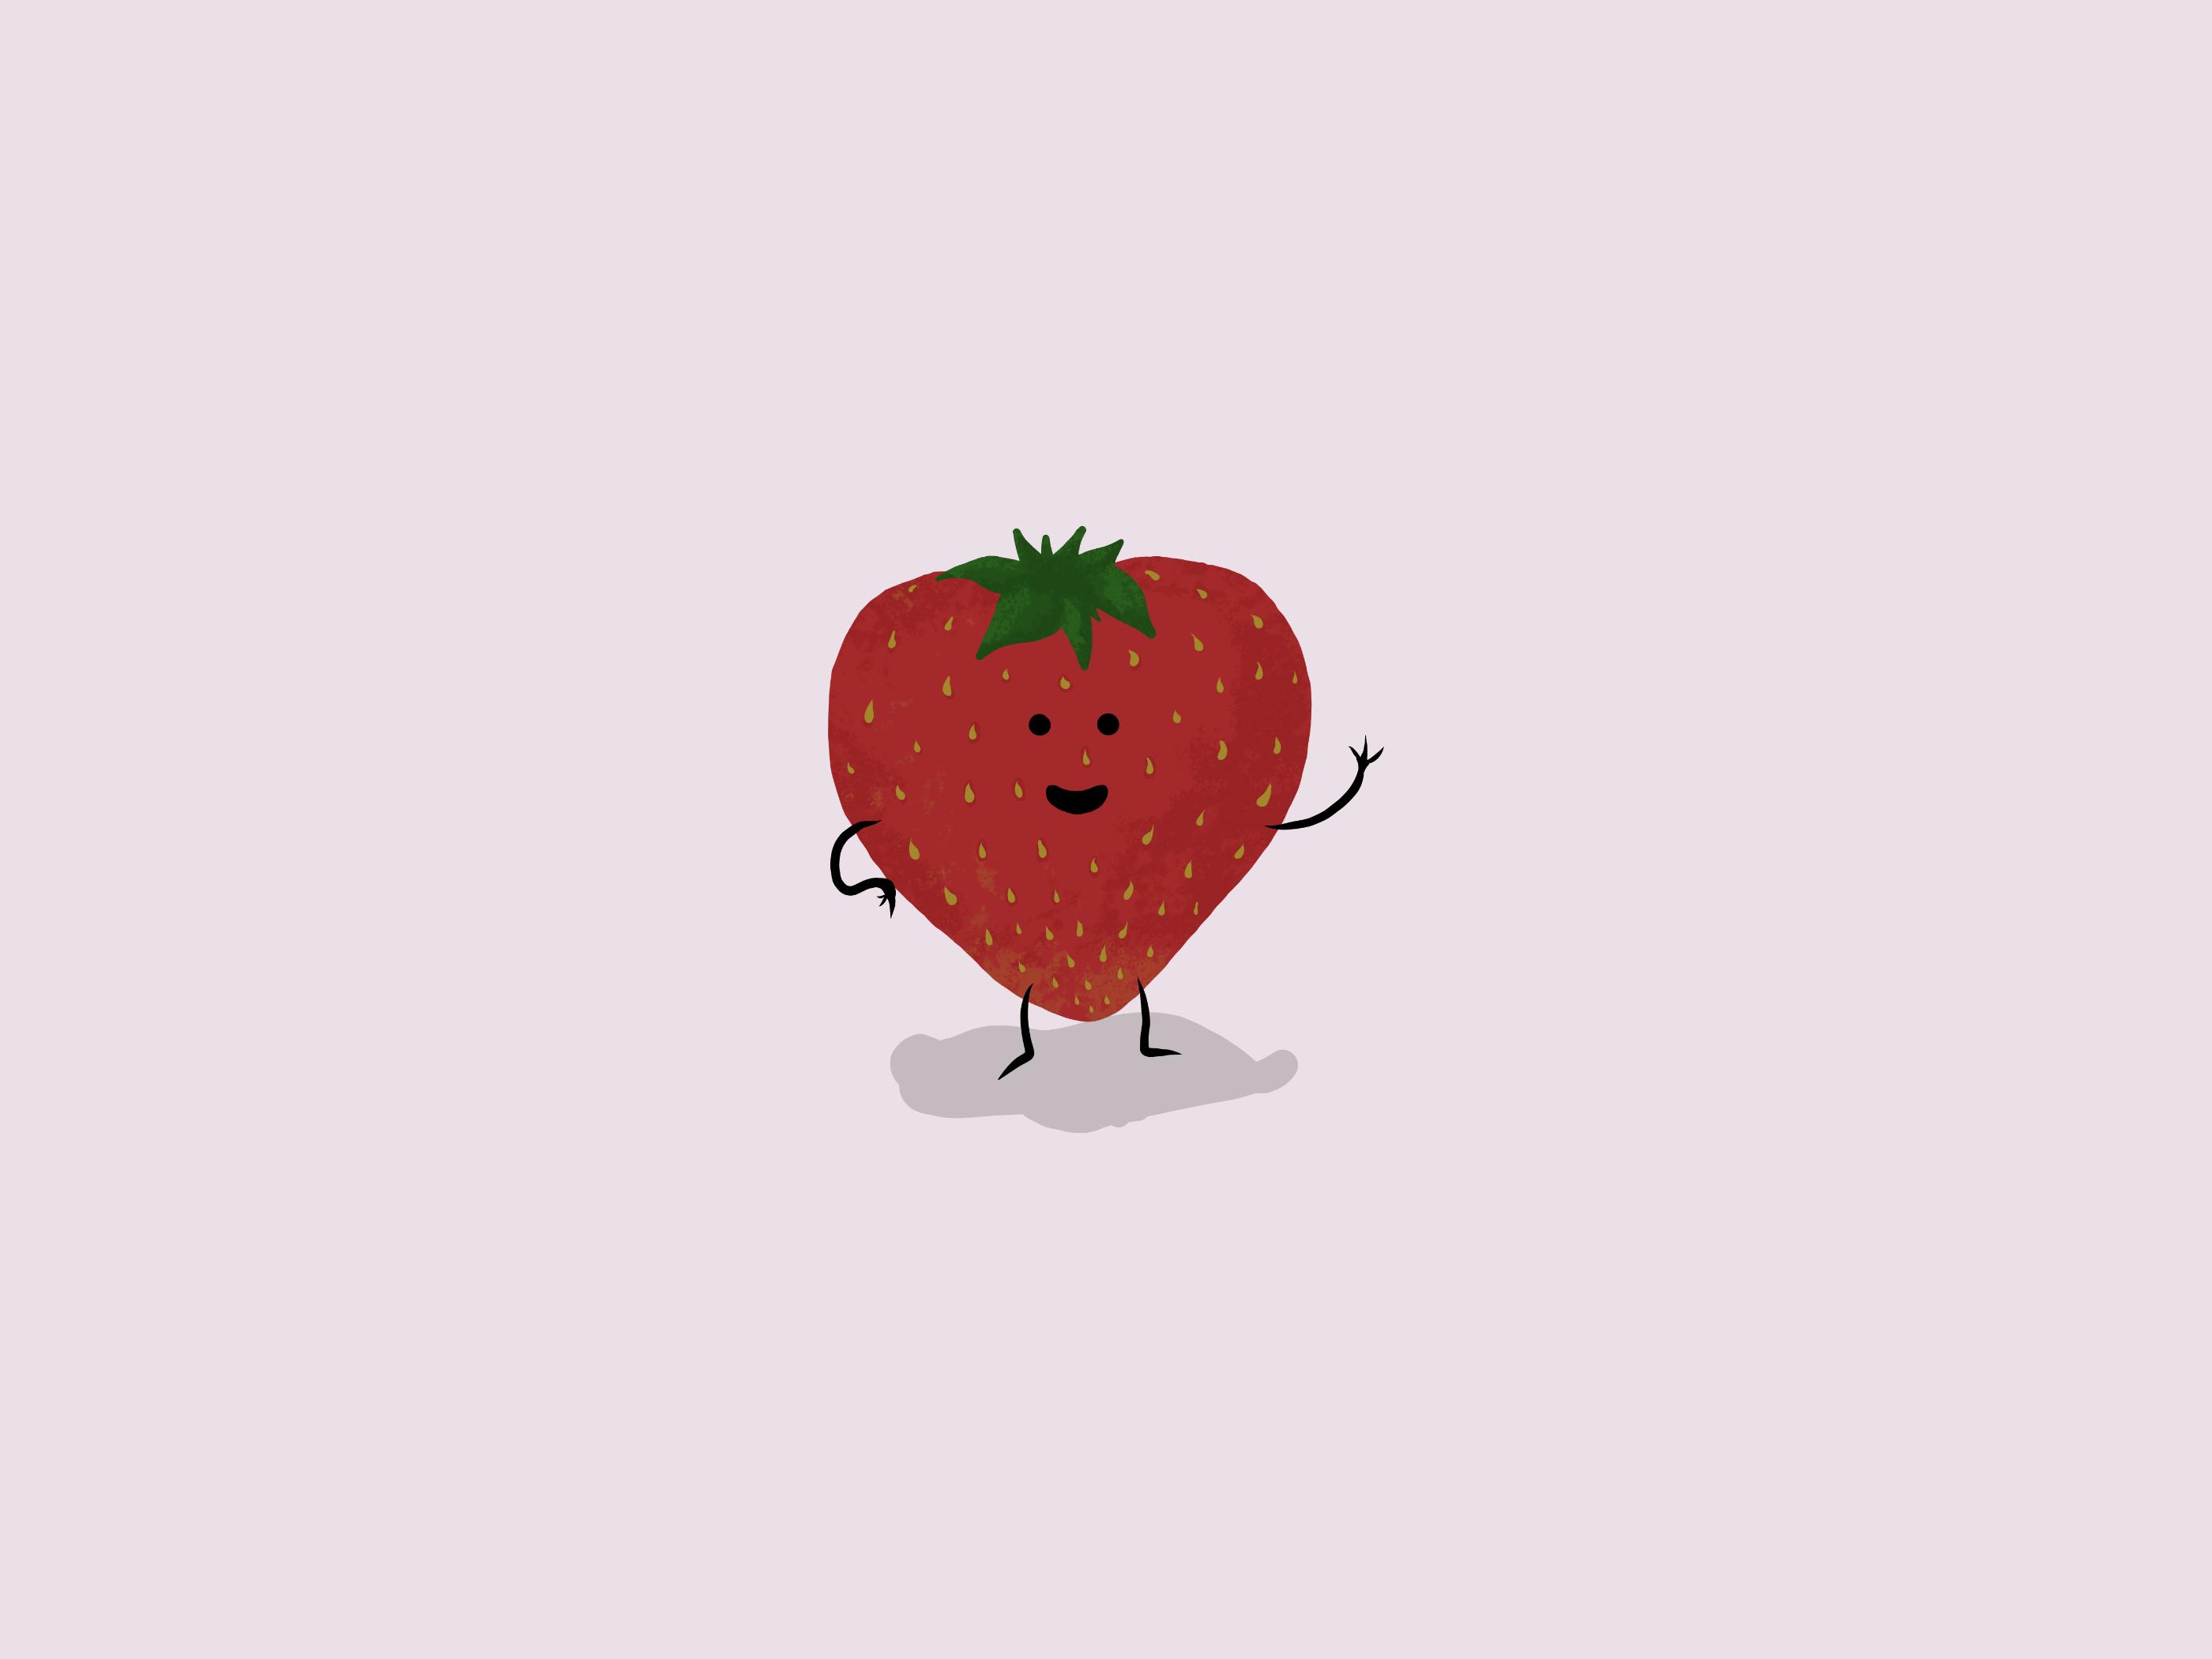 A Waving Strawberry